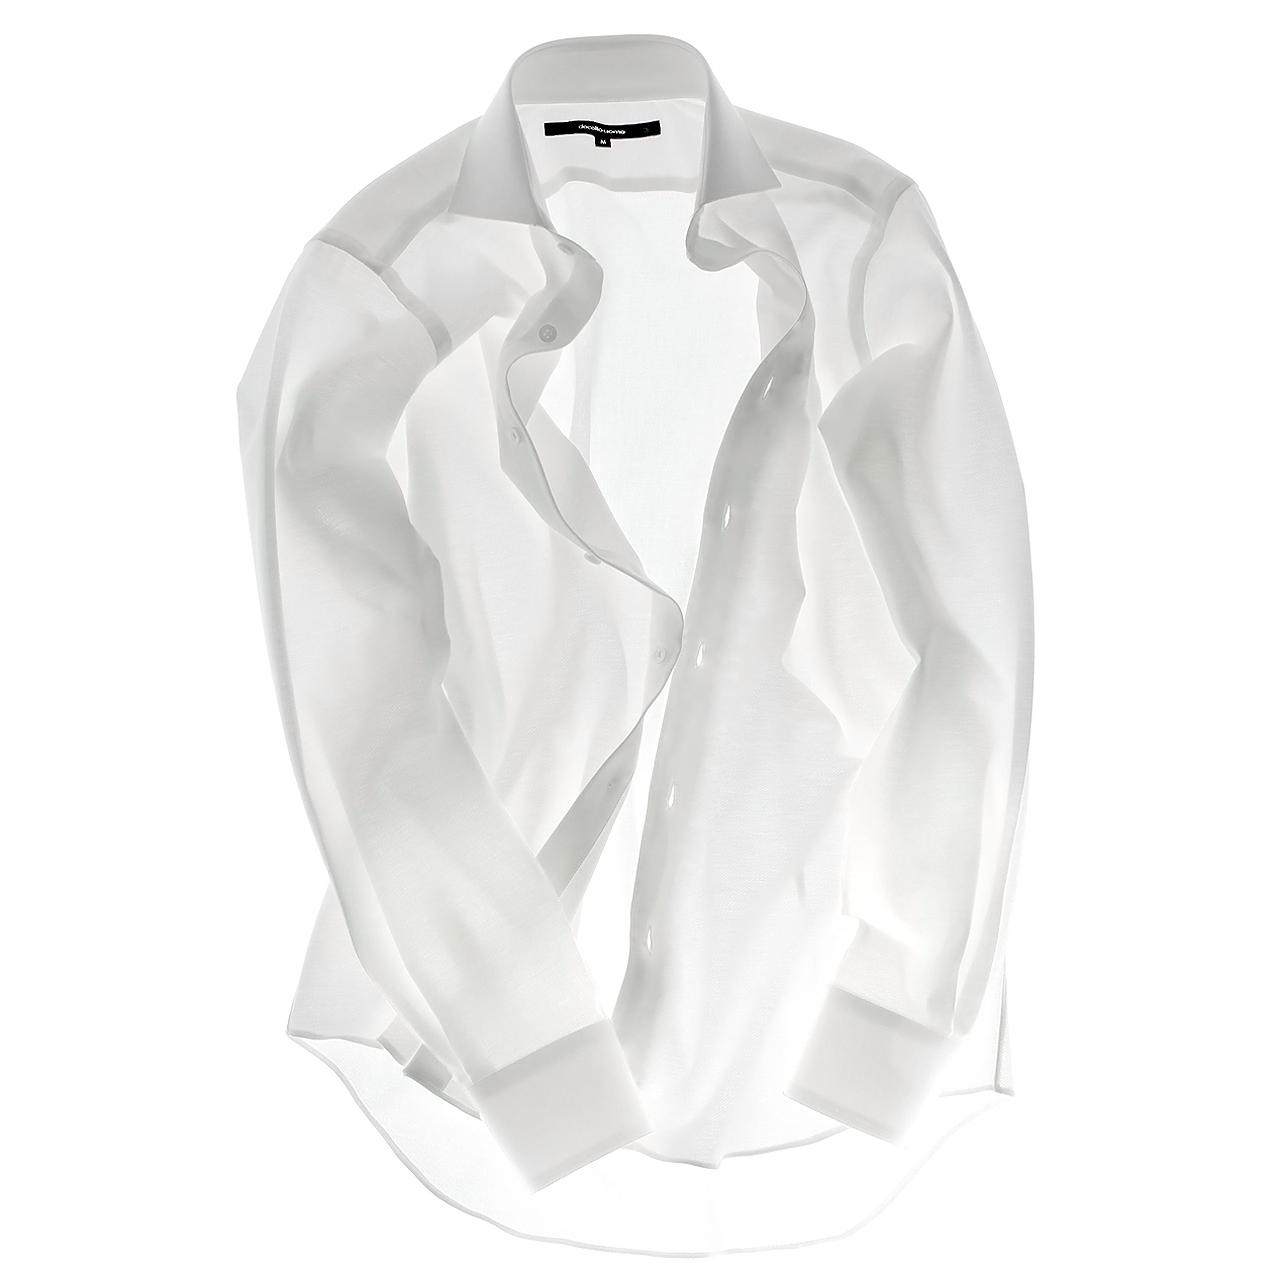 DJS-787X decollouomo メンズドレスシャツ overture - オーダーメイド